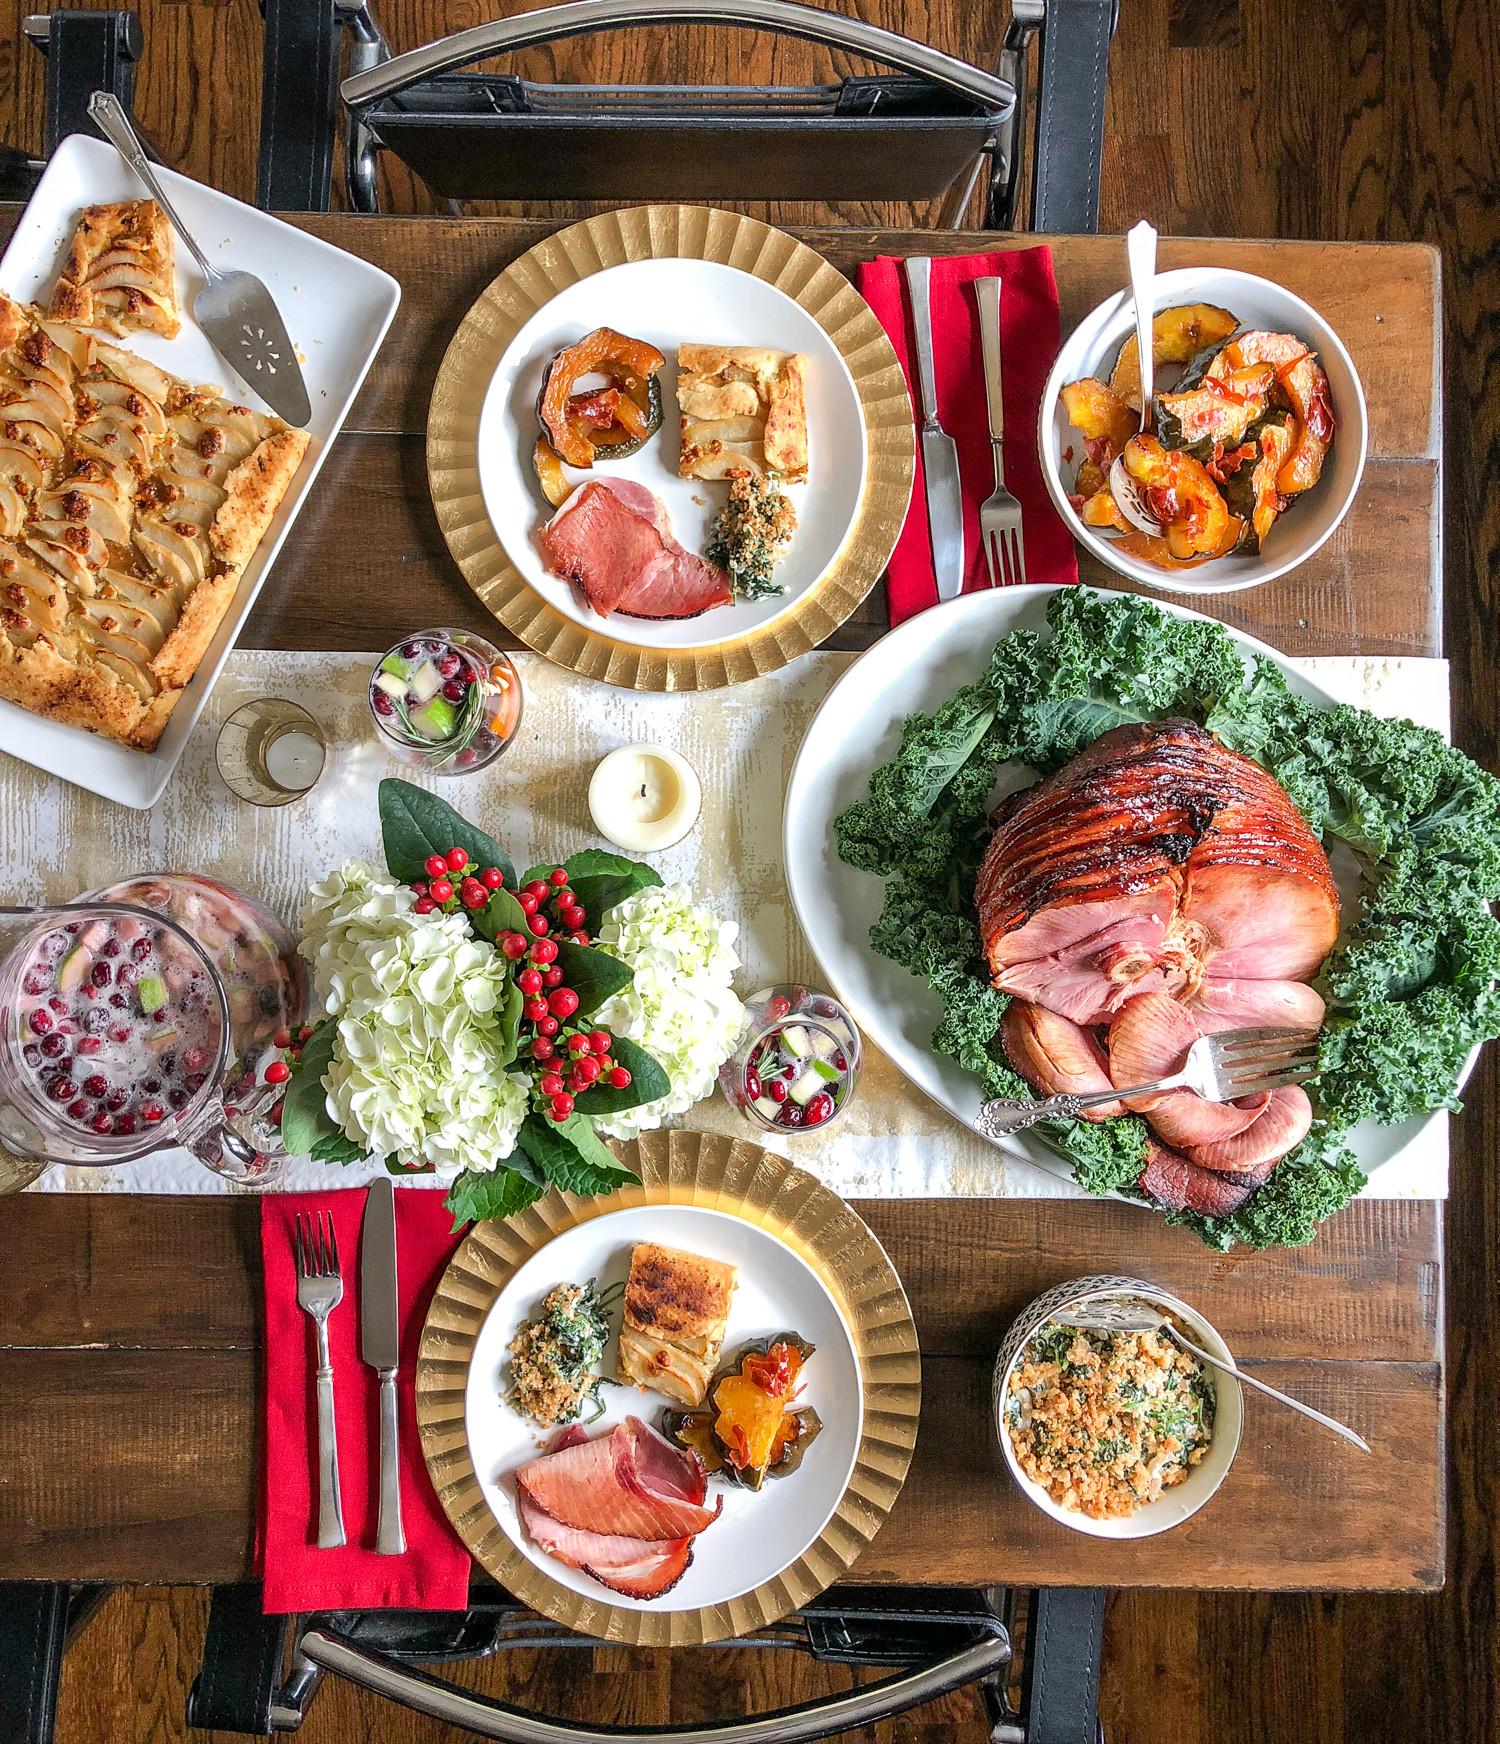 Christmas Dinner Recipes  Christmas Dinner Menu Ideas Plan a Memorable Meal for